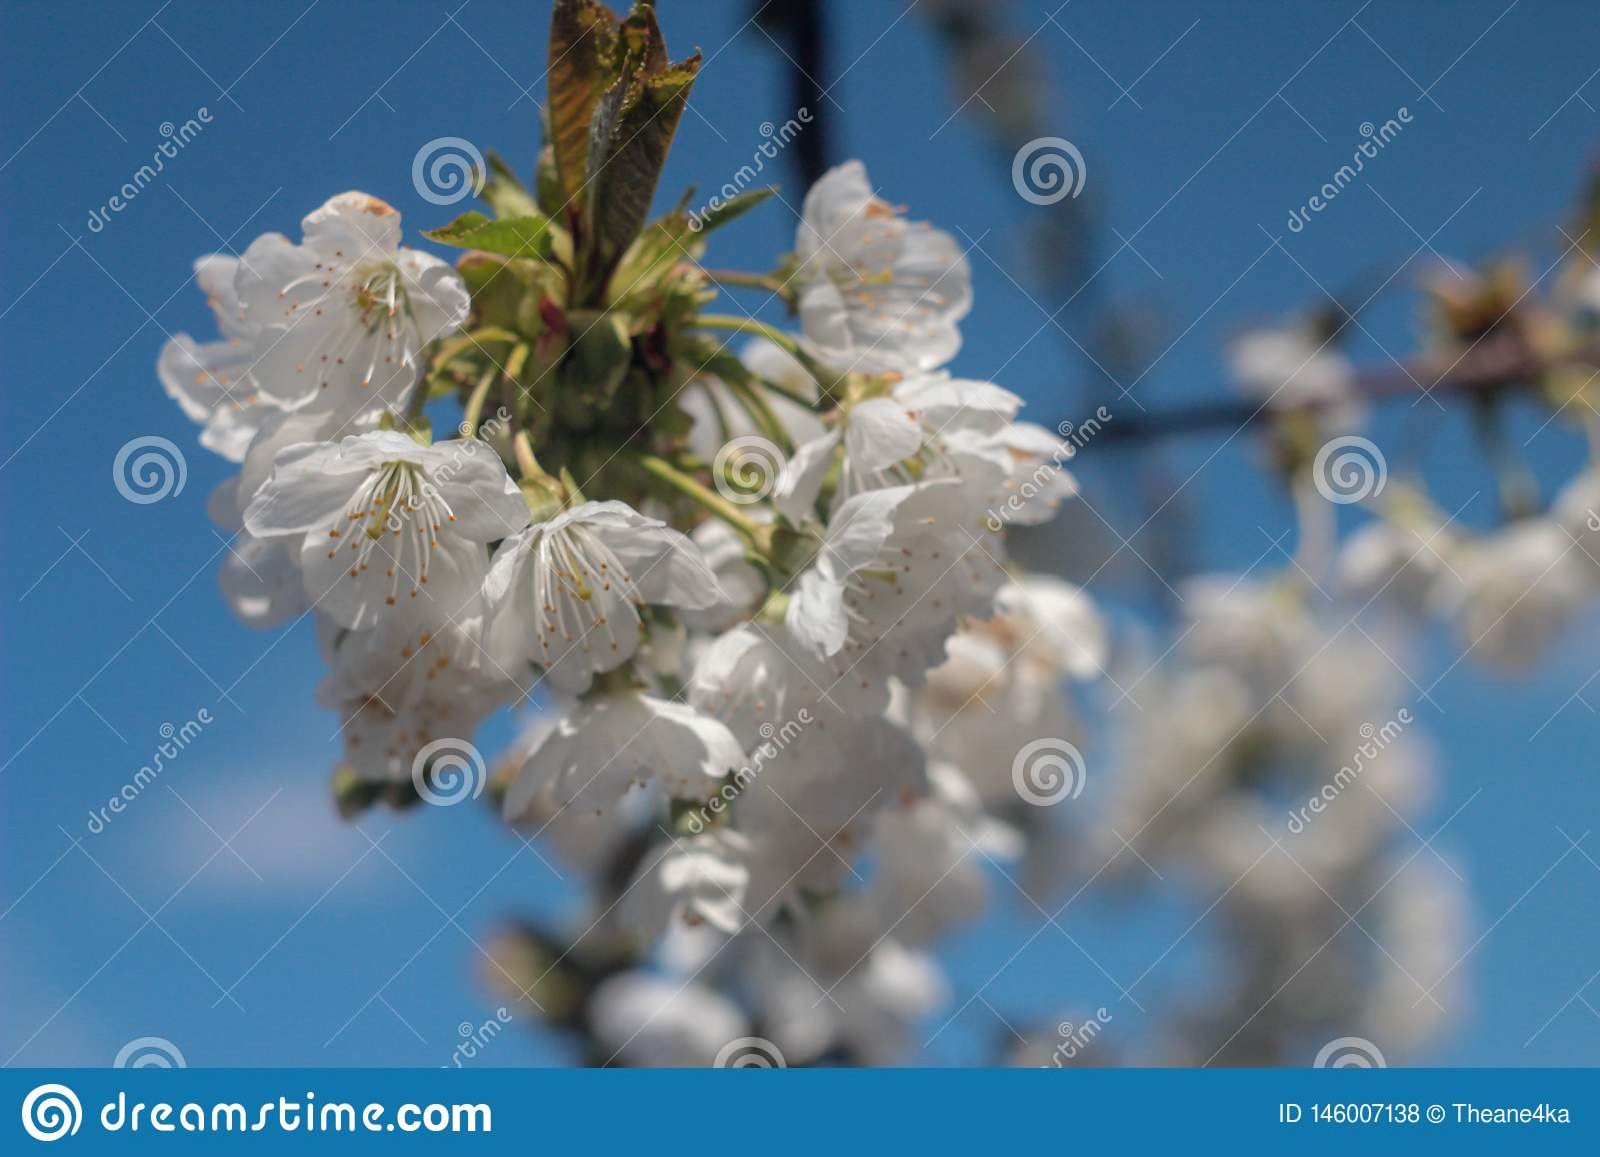 Photo of blooming cherry tree